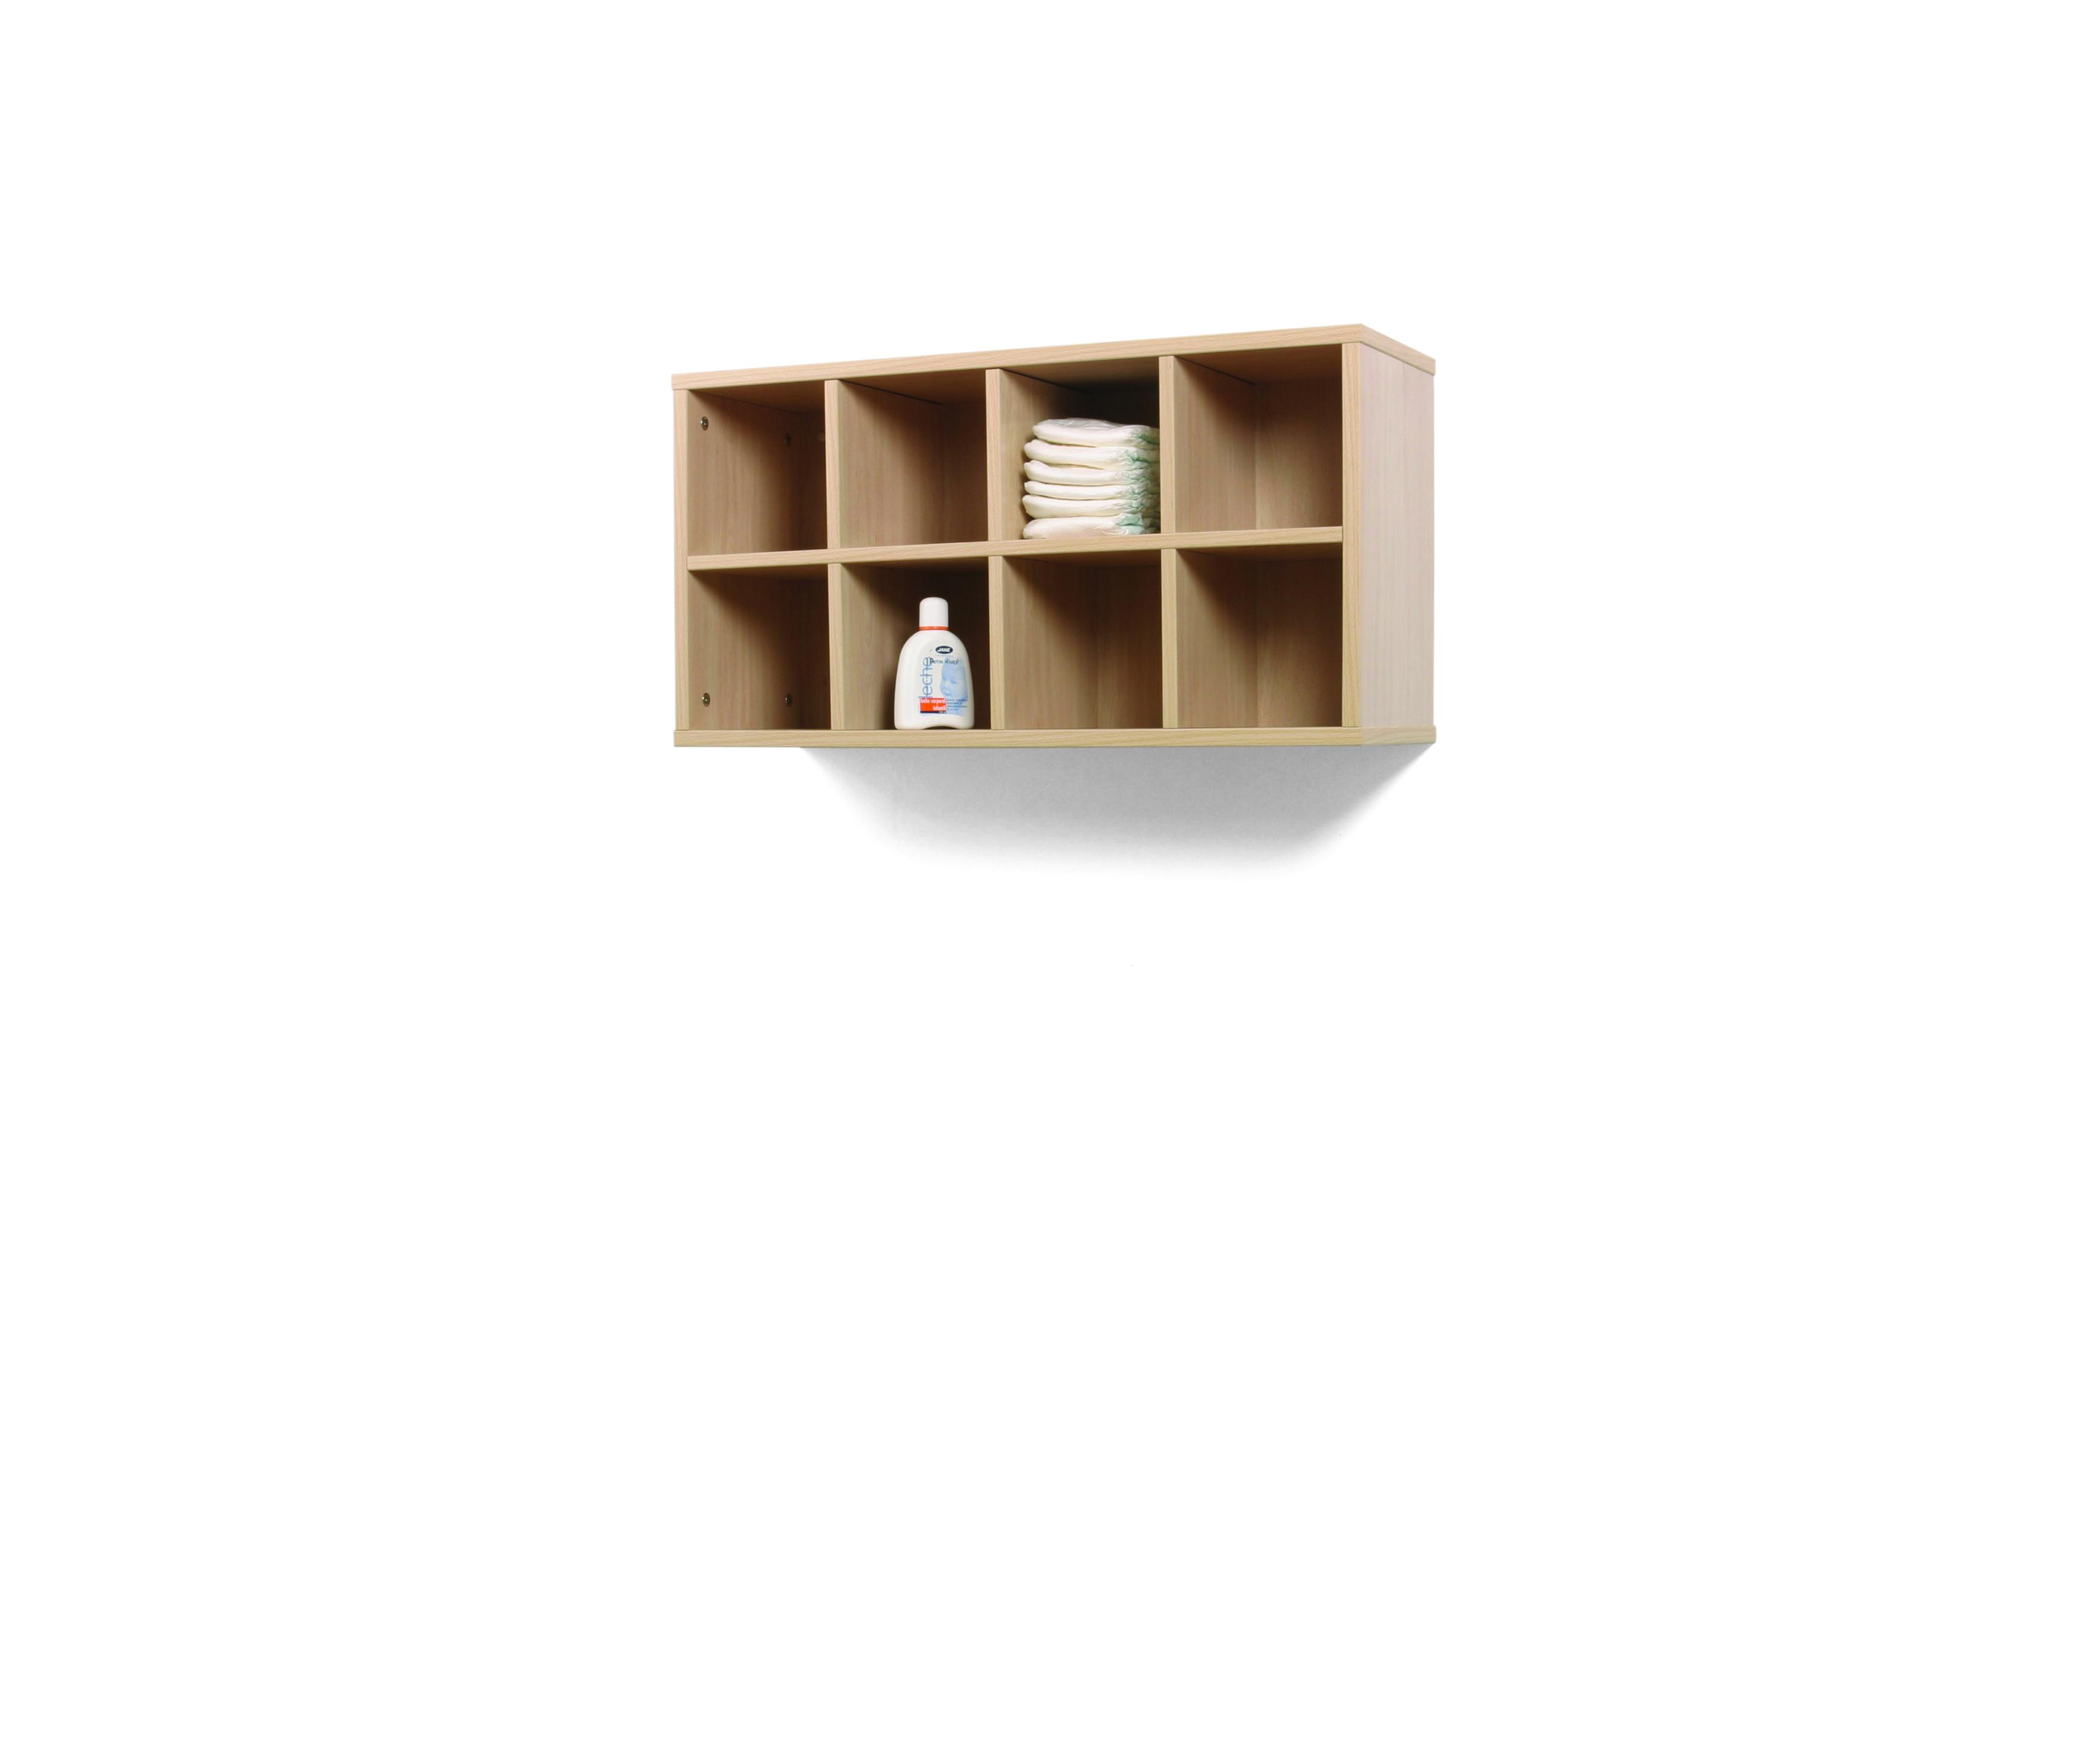 600703 mueble casillero 8 casillas 80 42 mobiliario for Mobiliario 8 80